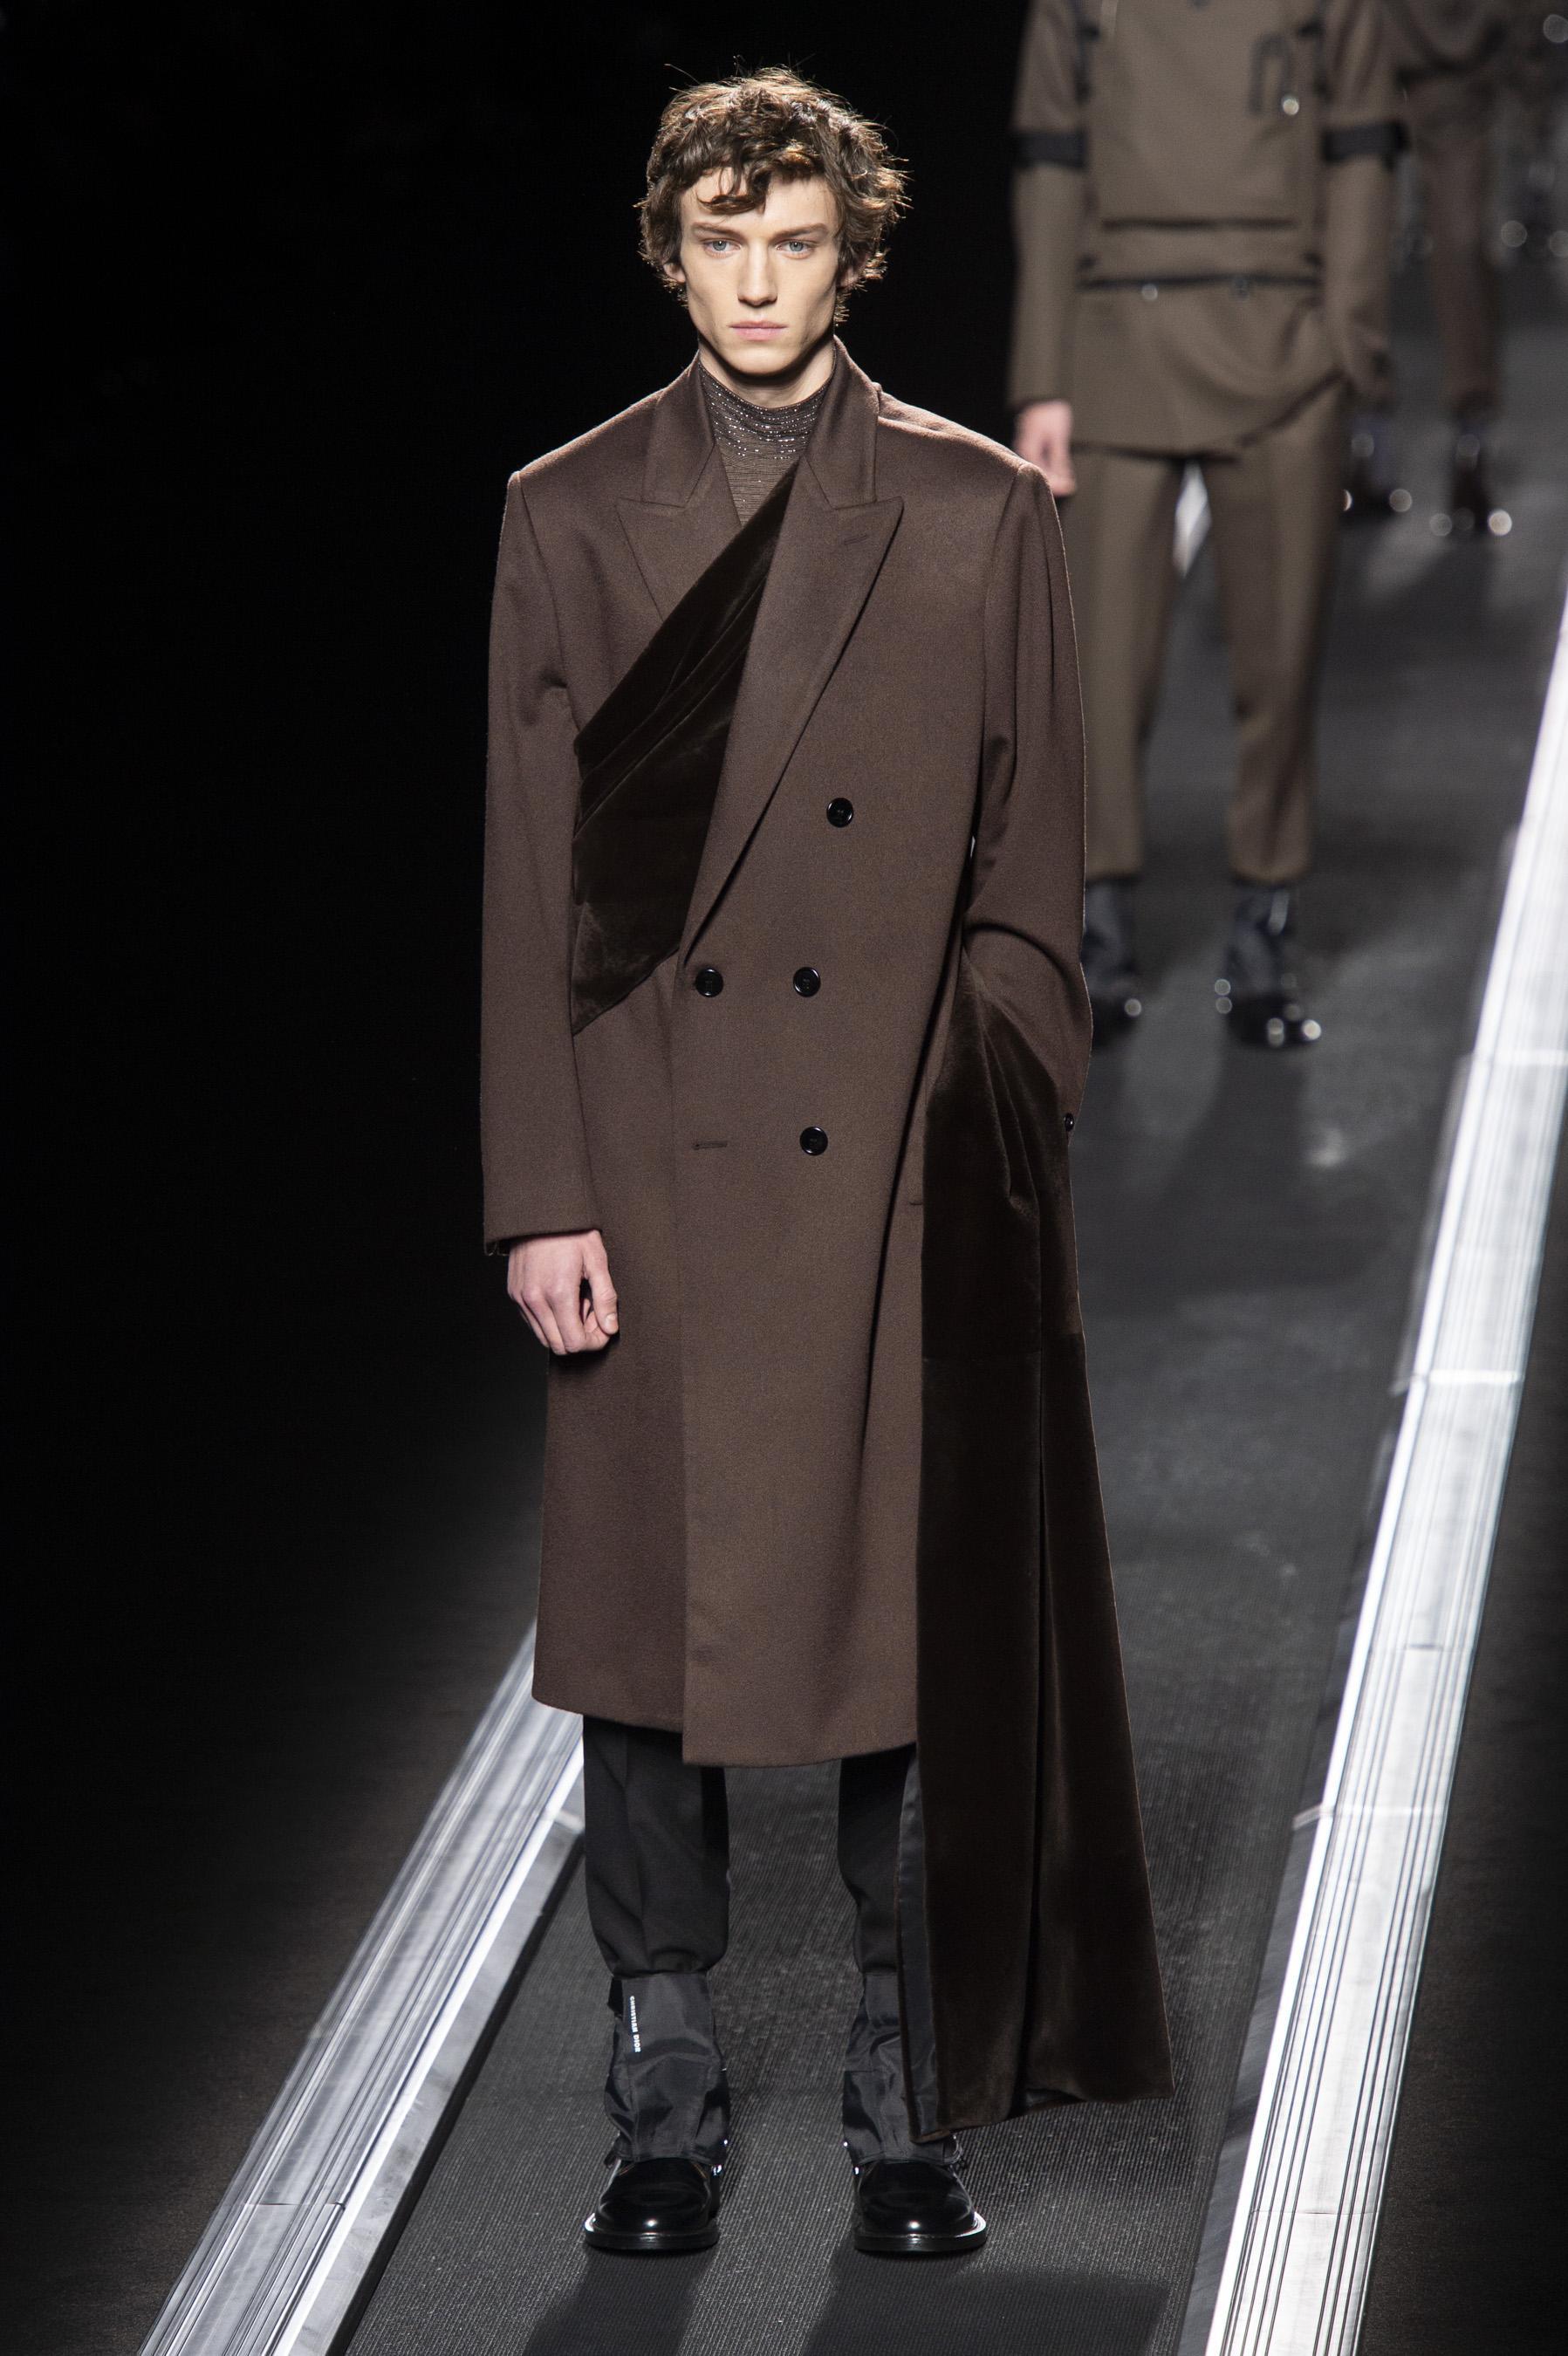 Défilé Dior Homme automne-hiver 2019-2020 Homme - Madame Figaro 03e04bdbb7a